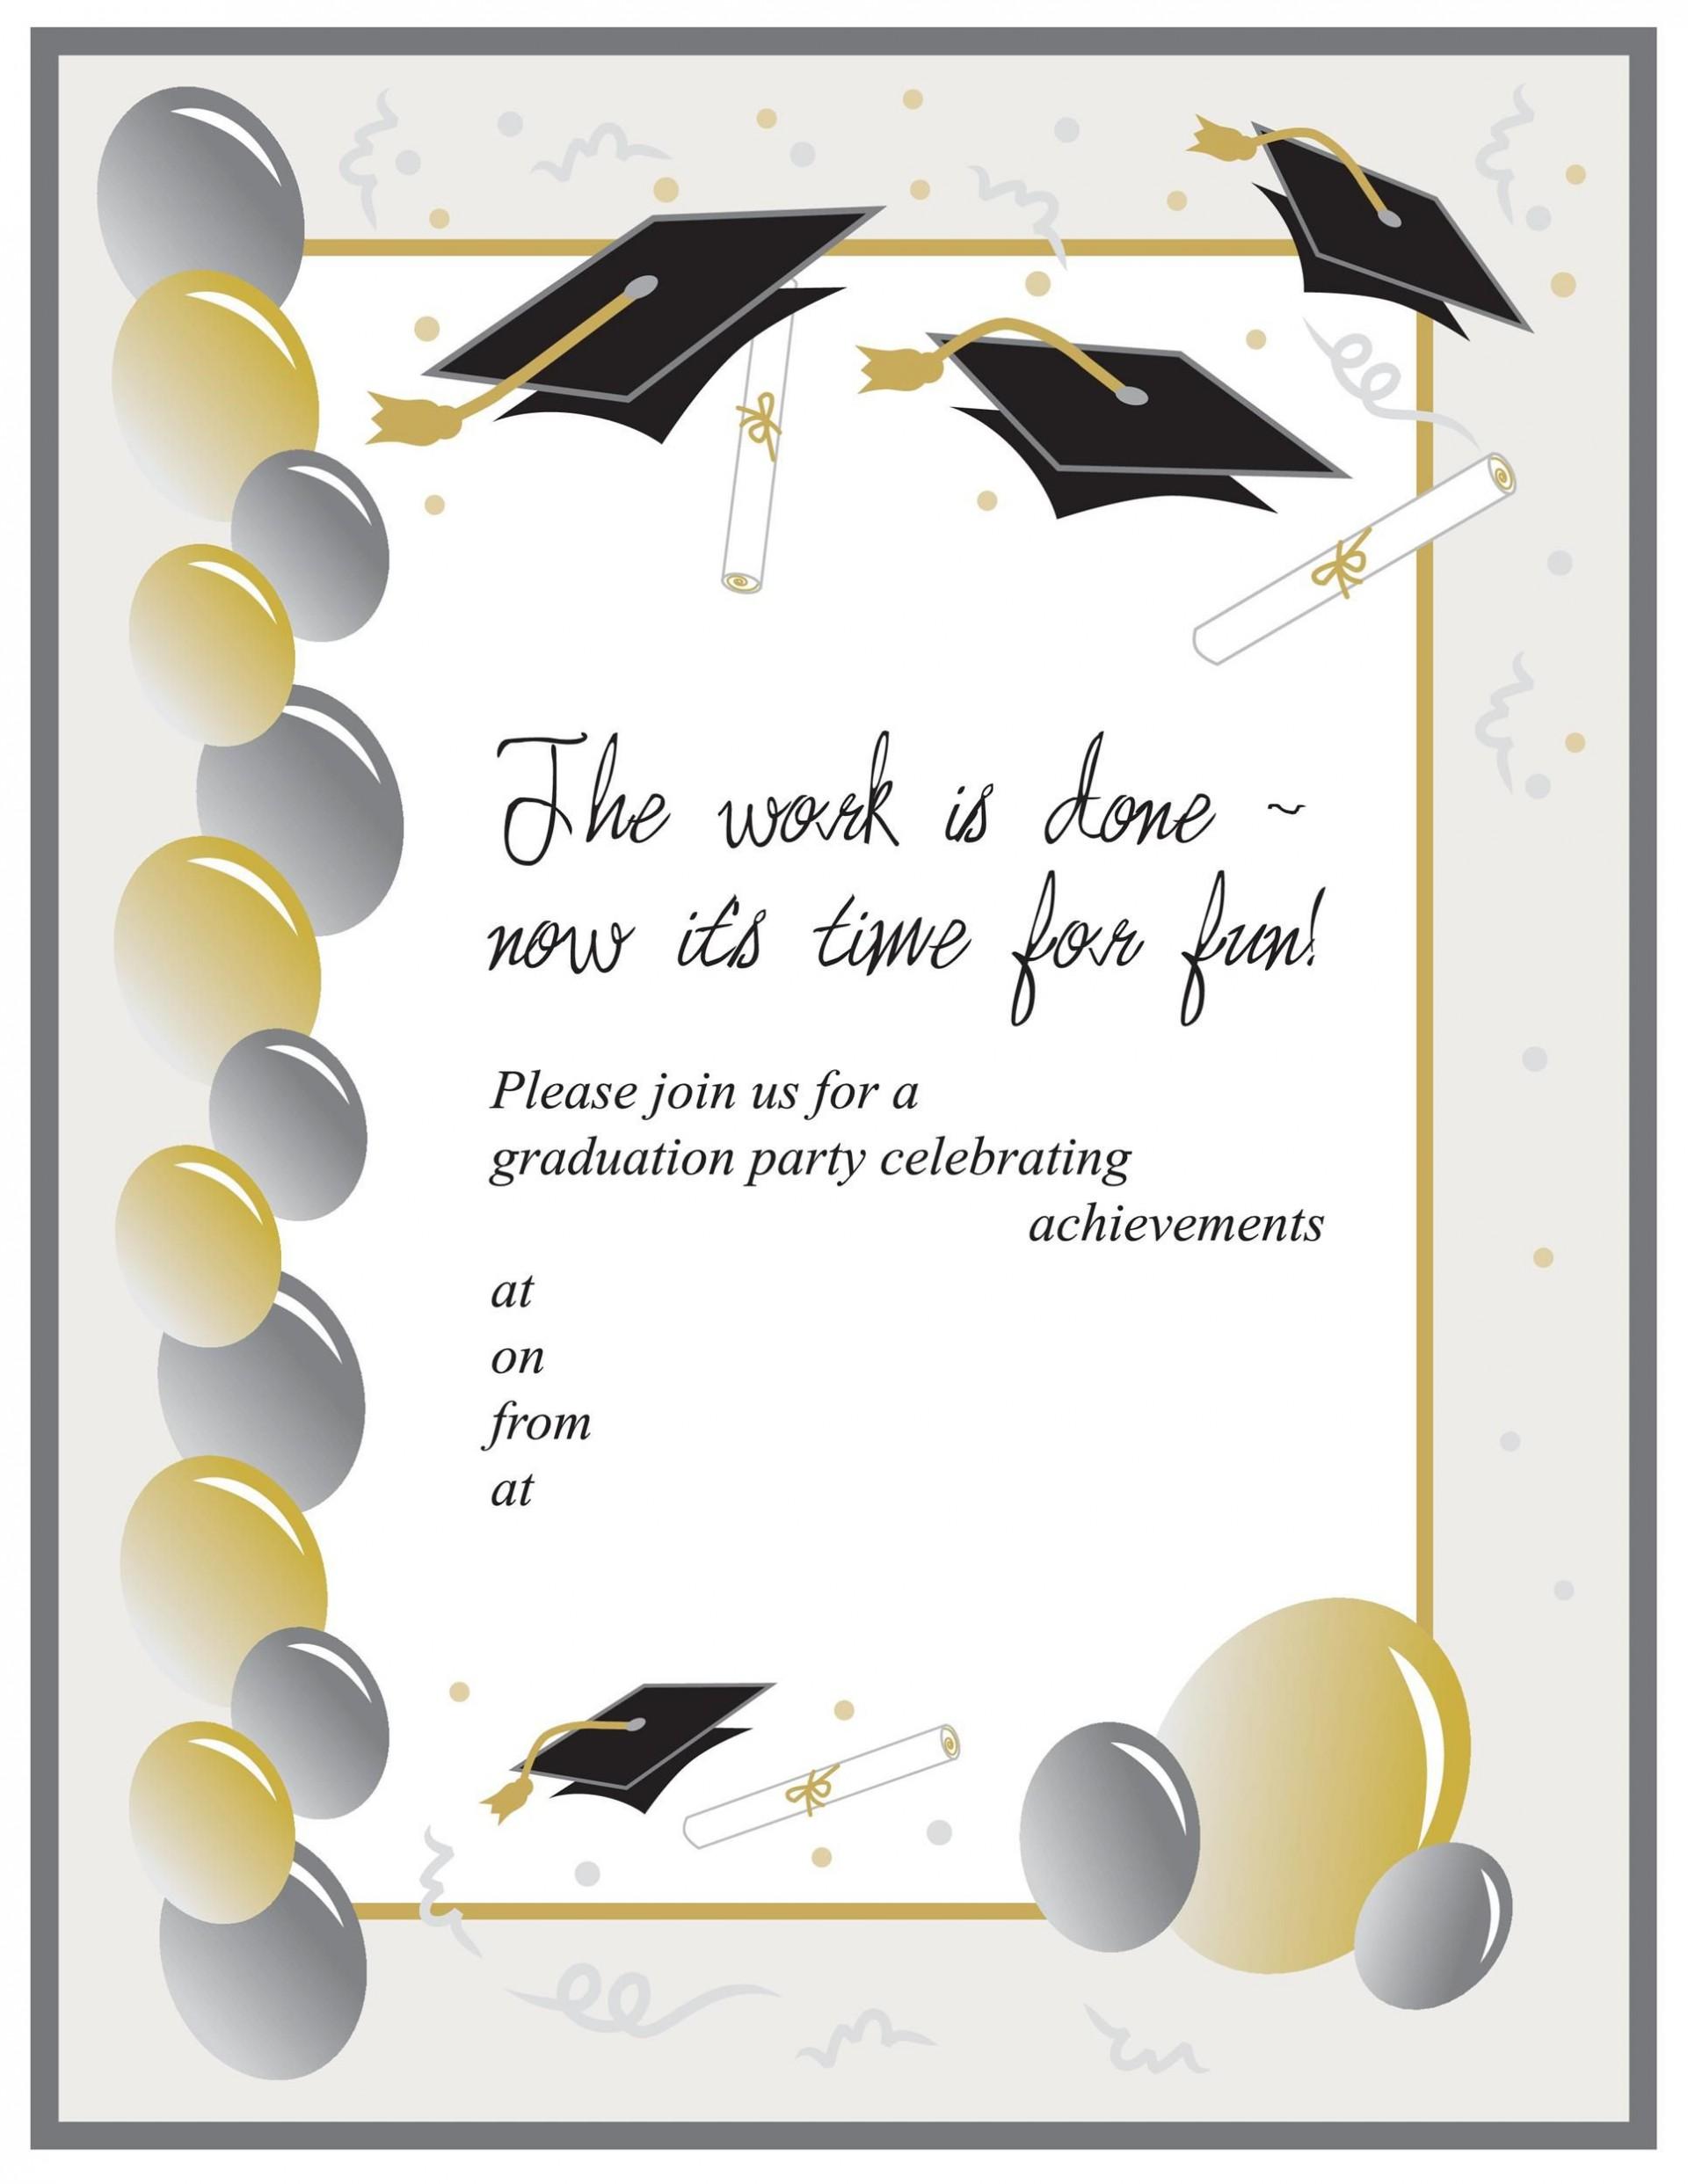 005 Unbelievable Graduation Party Invitation Template Inspiration  Templates 4 Per Page Free Reception1920